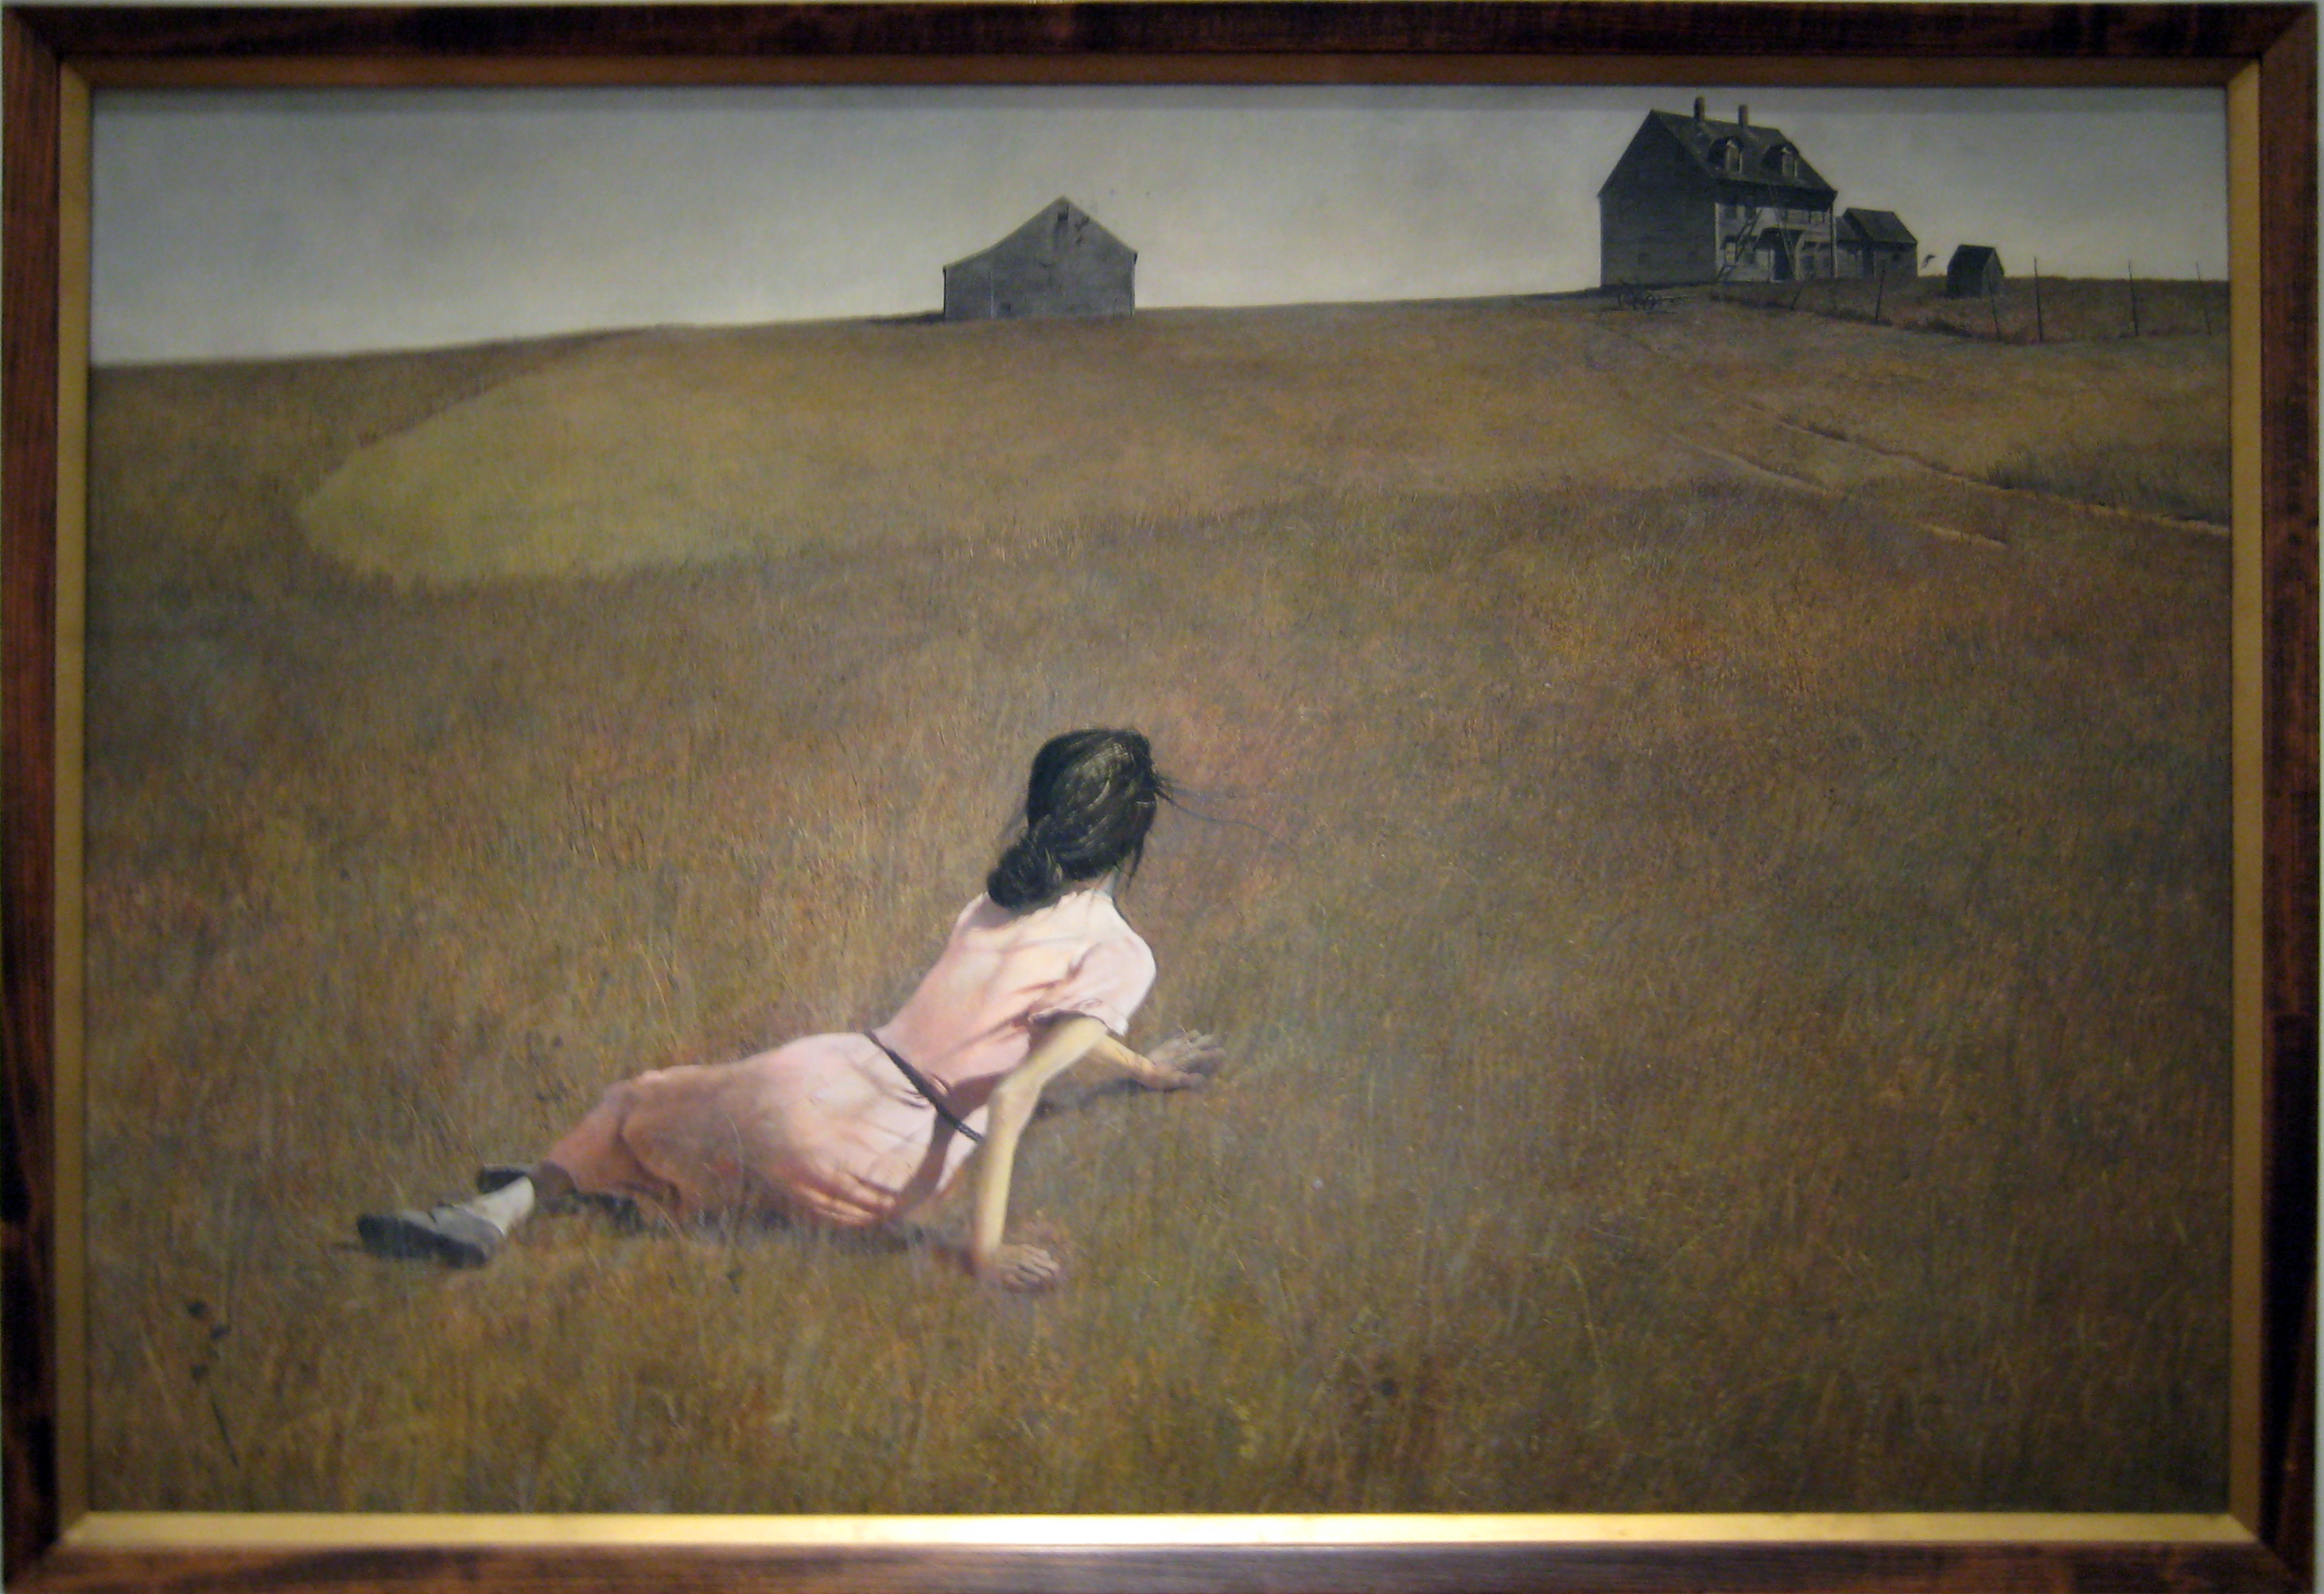 Andrew Wyeth: Christina's World (1948)